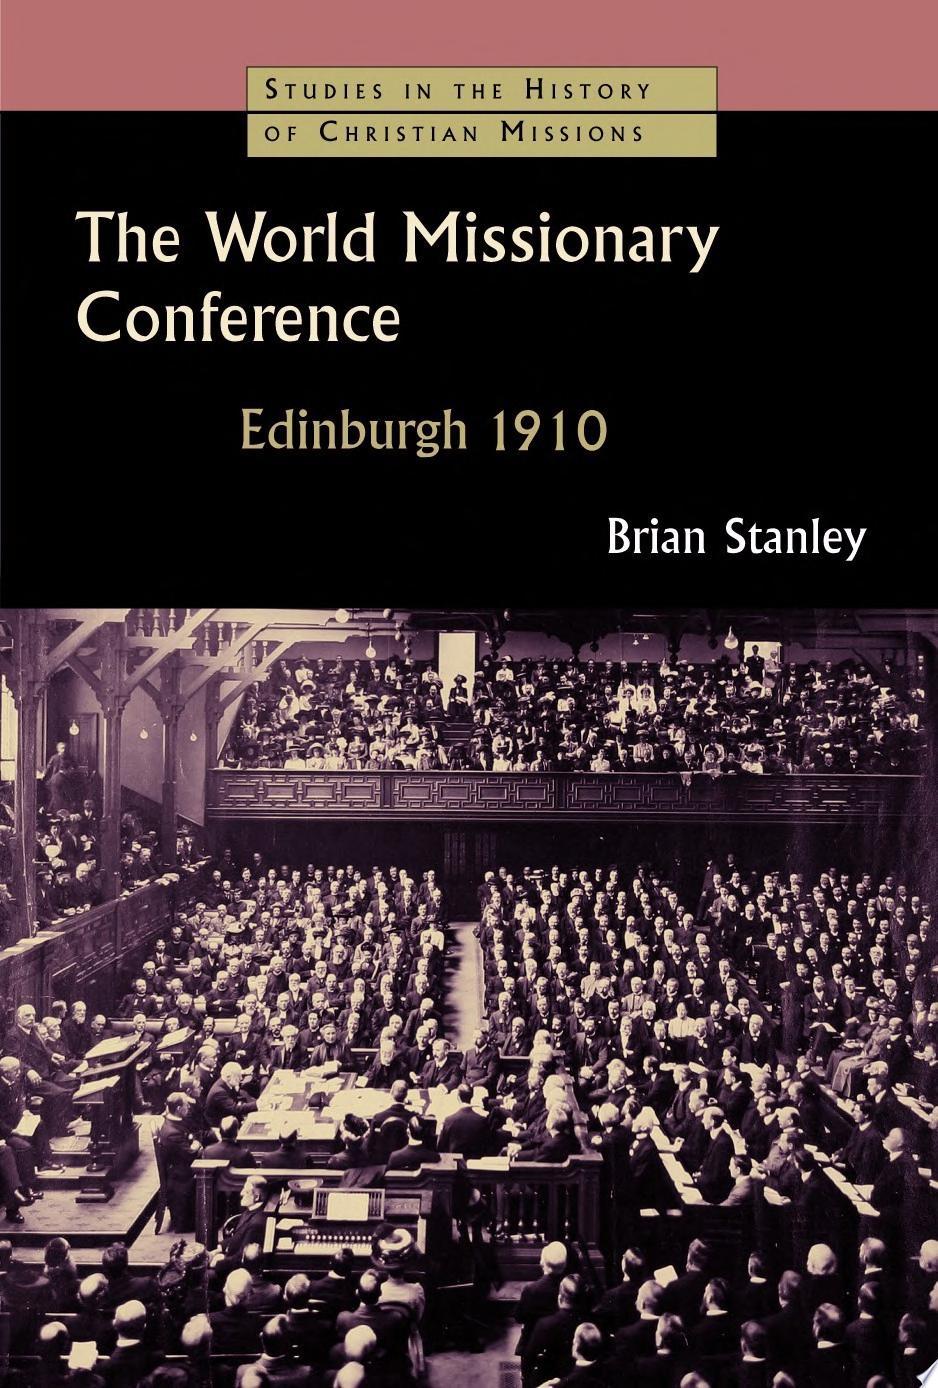 The World Missionary Conference  Edinburgh 1910